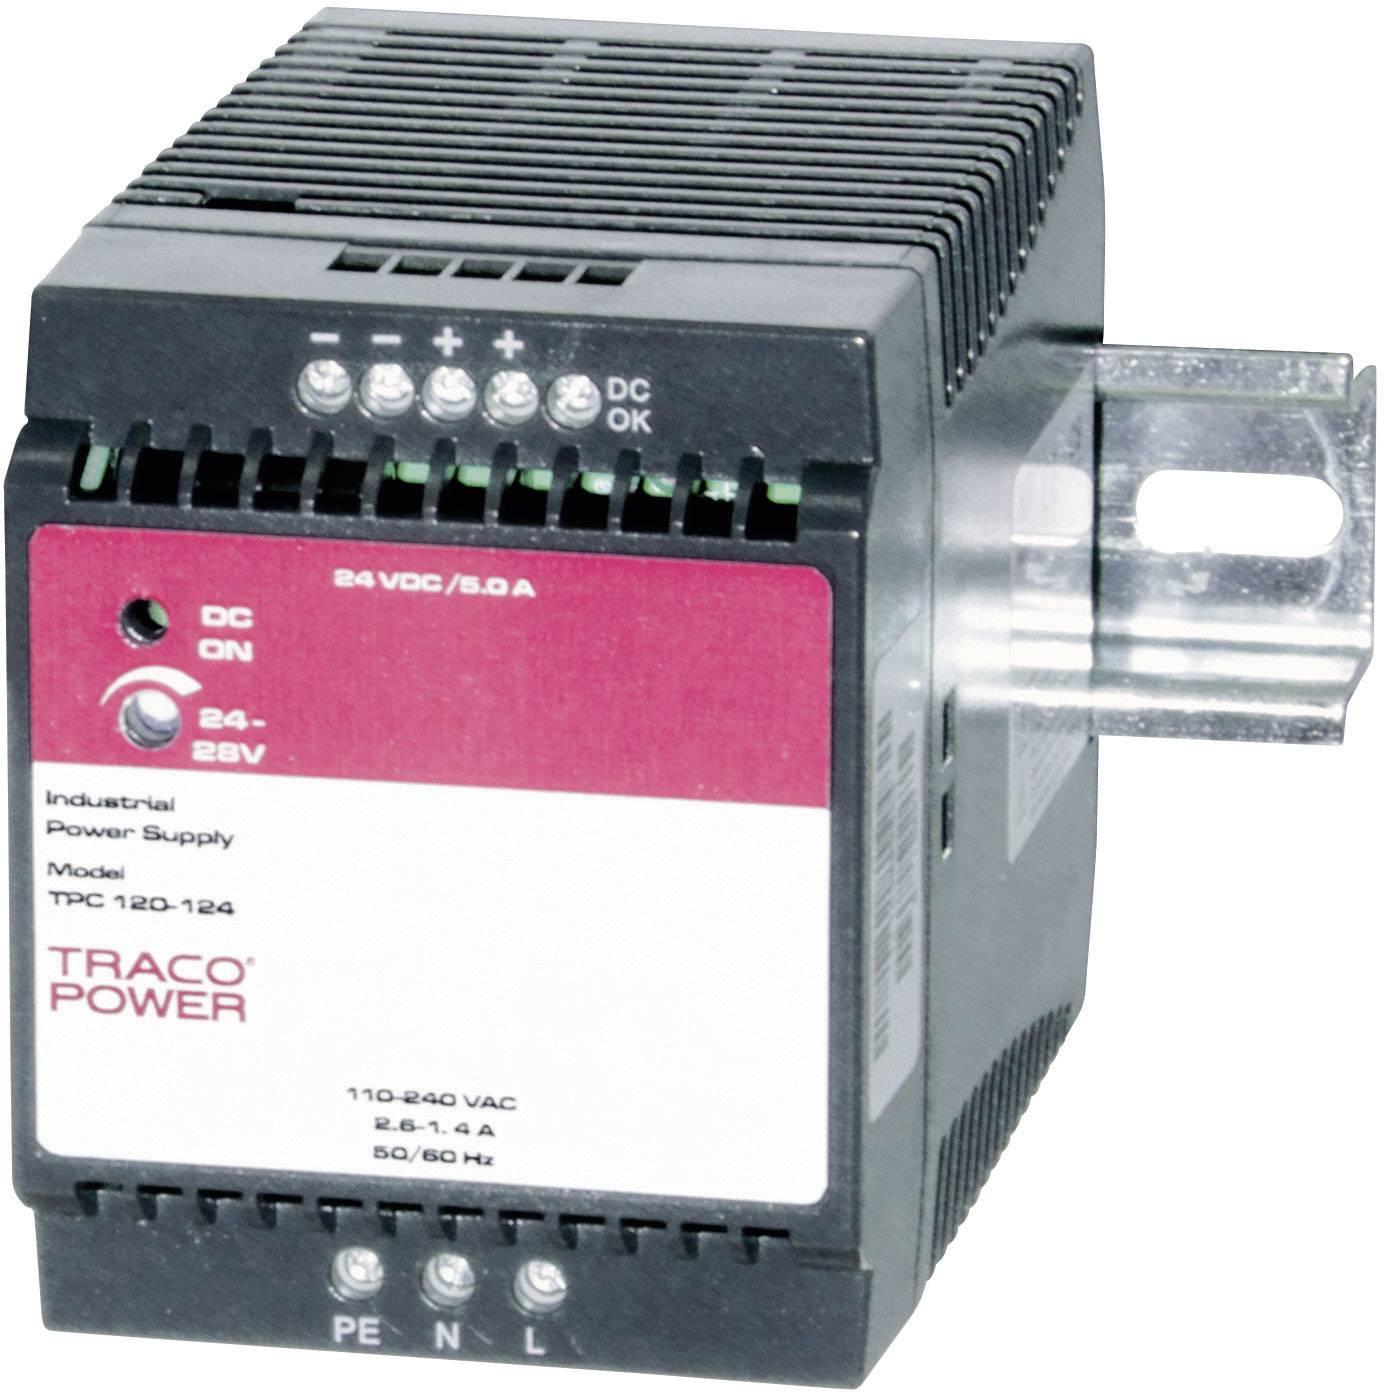 Zdroj na DIN lištu TracoPower TPC 120-124, 24 - 28,8 V/DC, 5 A